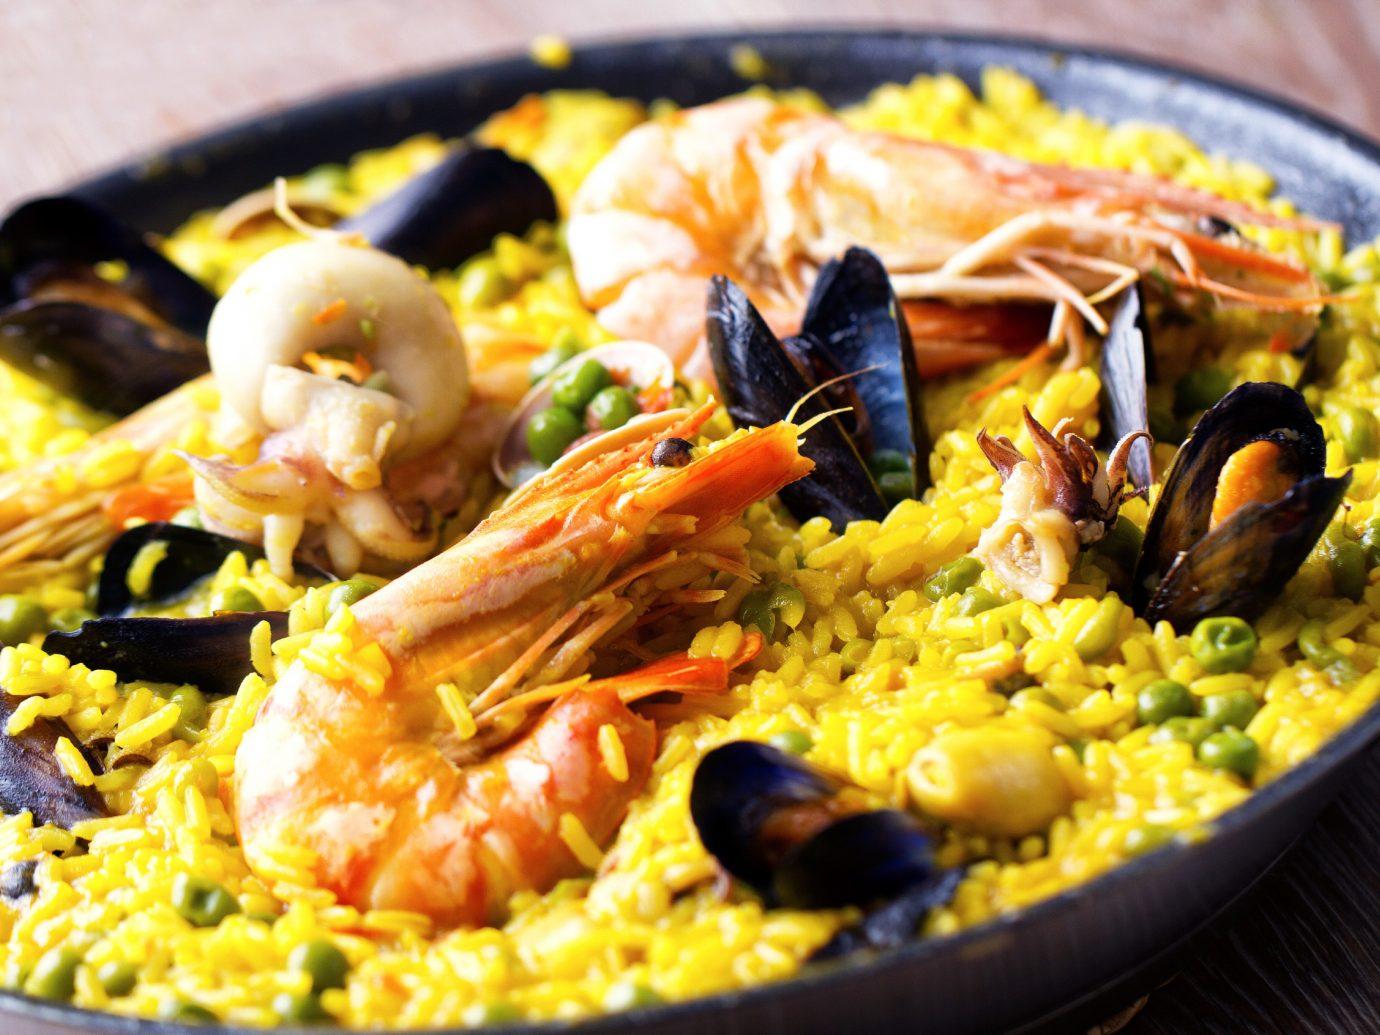 Dining Eat Food + Drink Resort food paella dish plate cuisine meal asian food european food thai food spanish cuisine fried rice